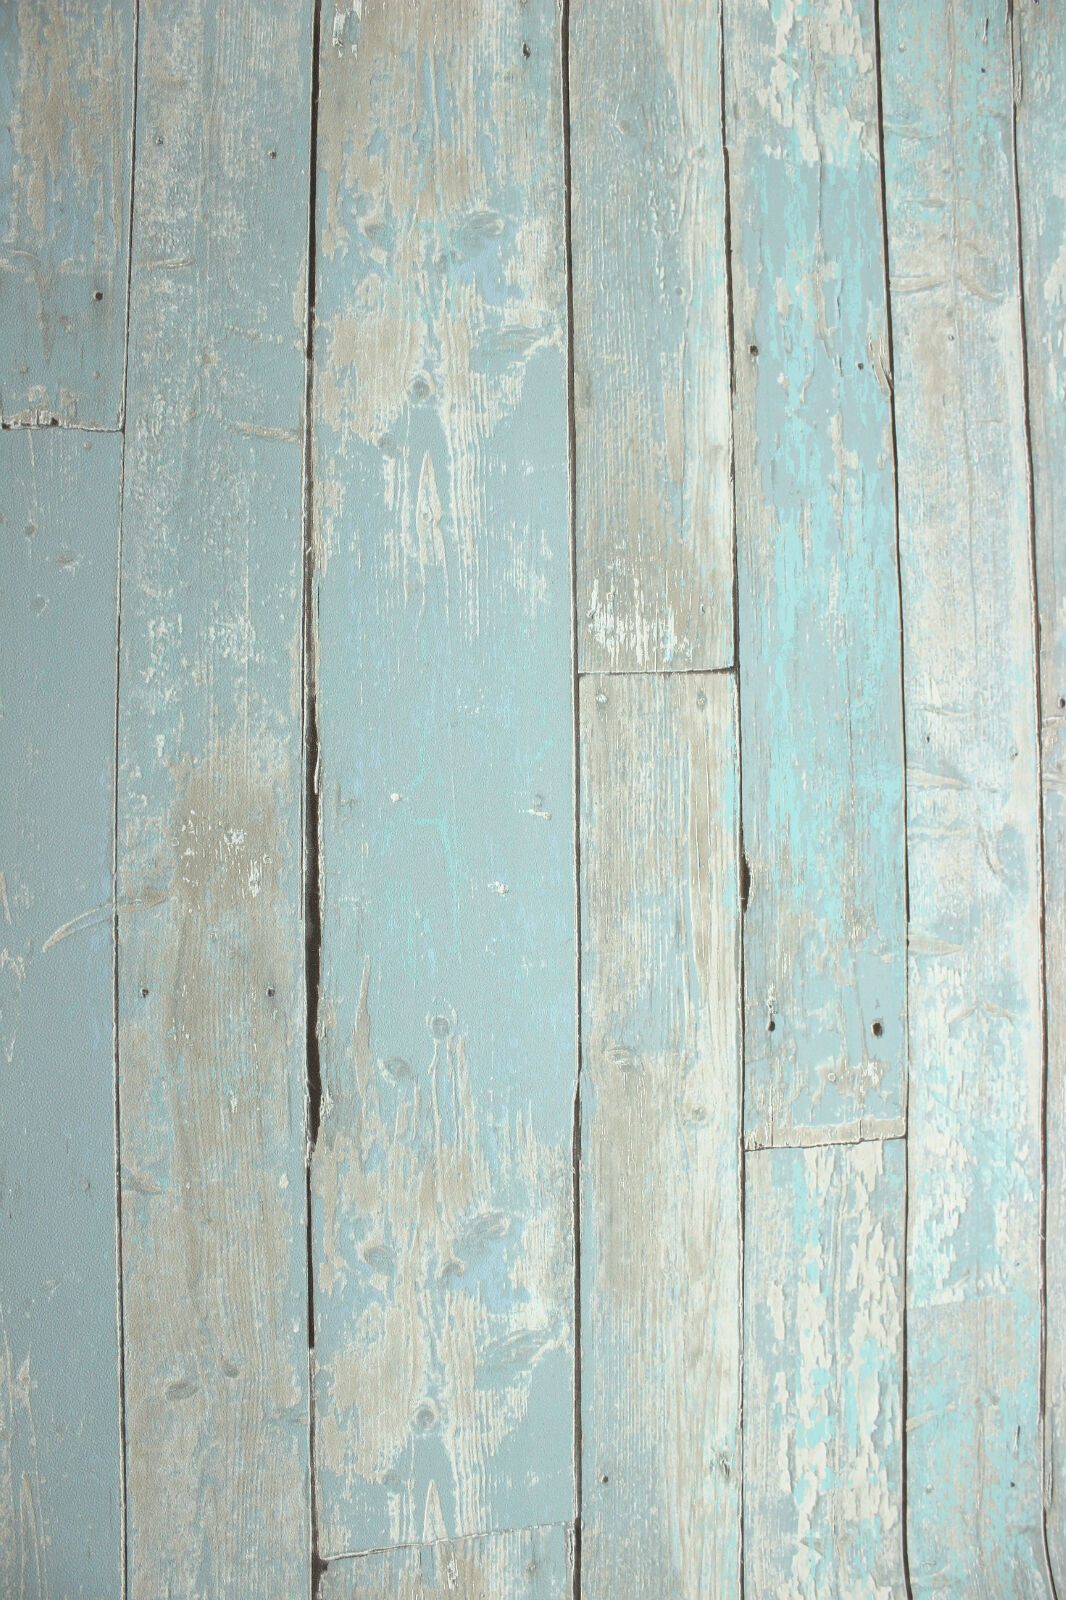 vlies tapete antik holz rustikal blau t rkis beige bretter. Black Bedroom Furniture Sets. Home Design Ideas